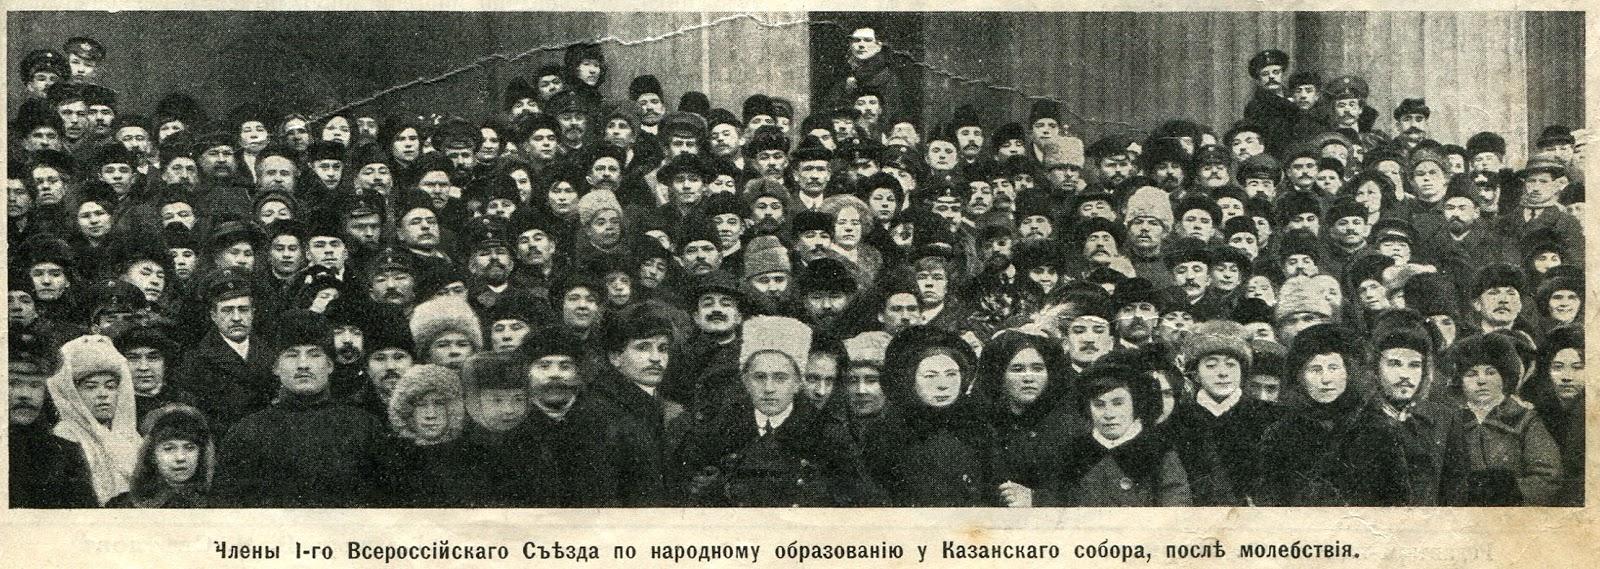 Нива 1914 №3 - копия (2) - копия (2).jpg